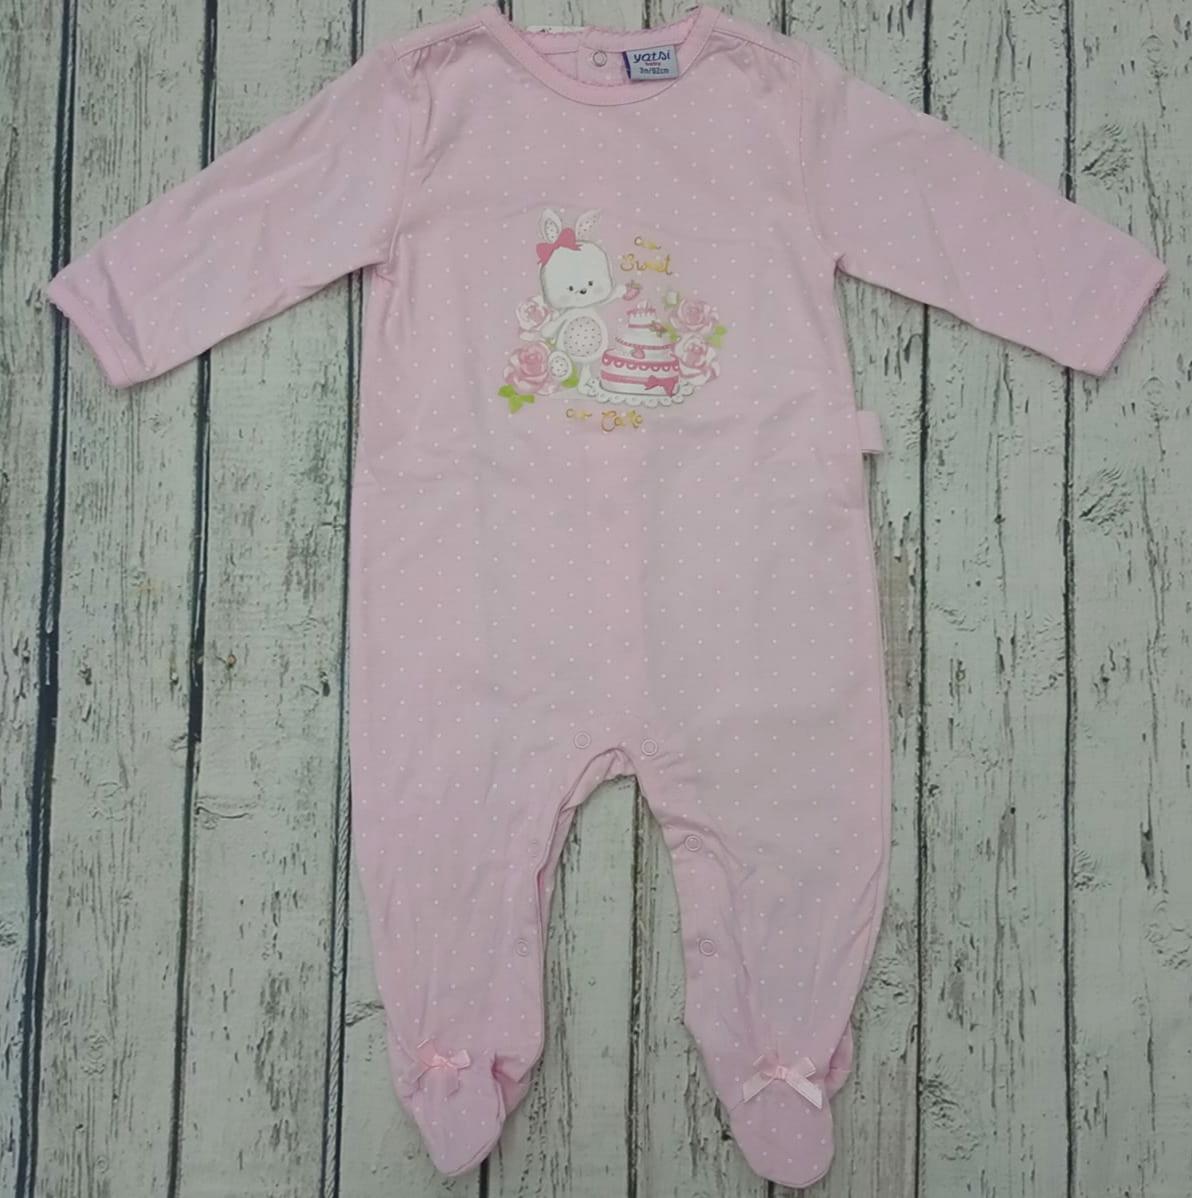 Pijama de bebé Rosa de Yatsi.